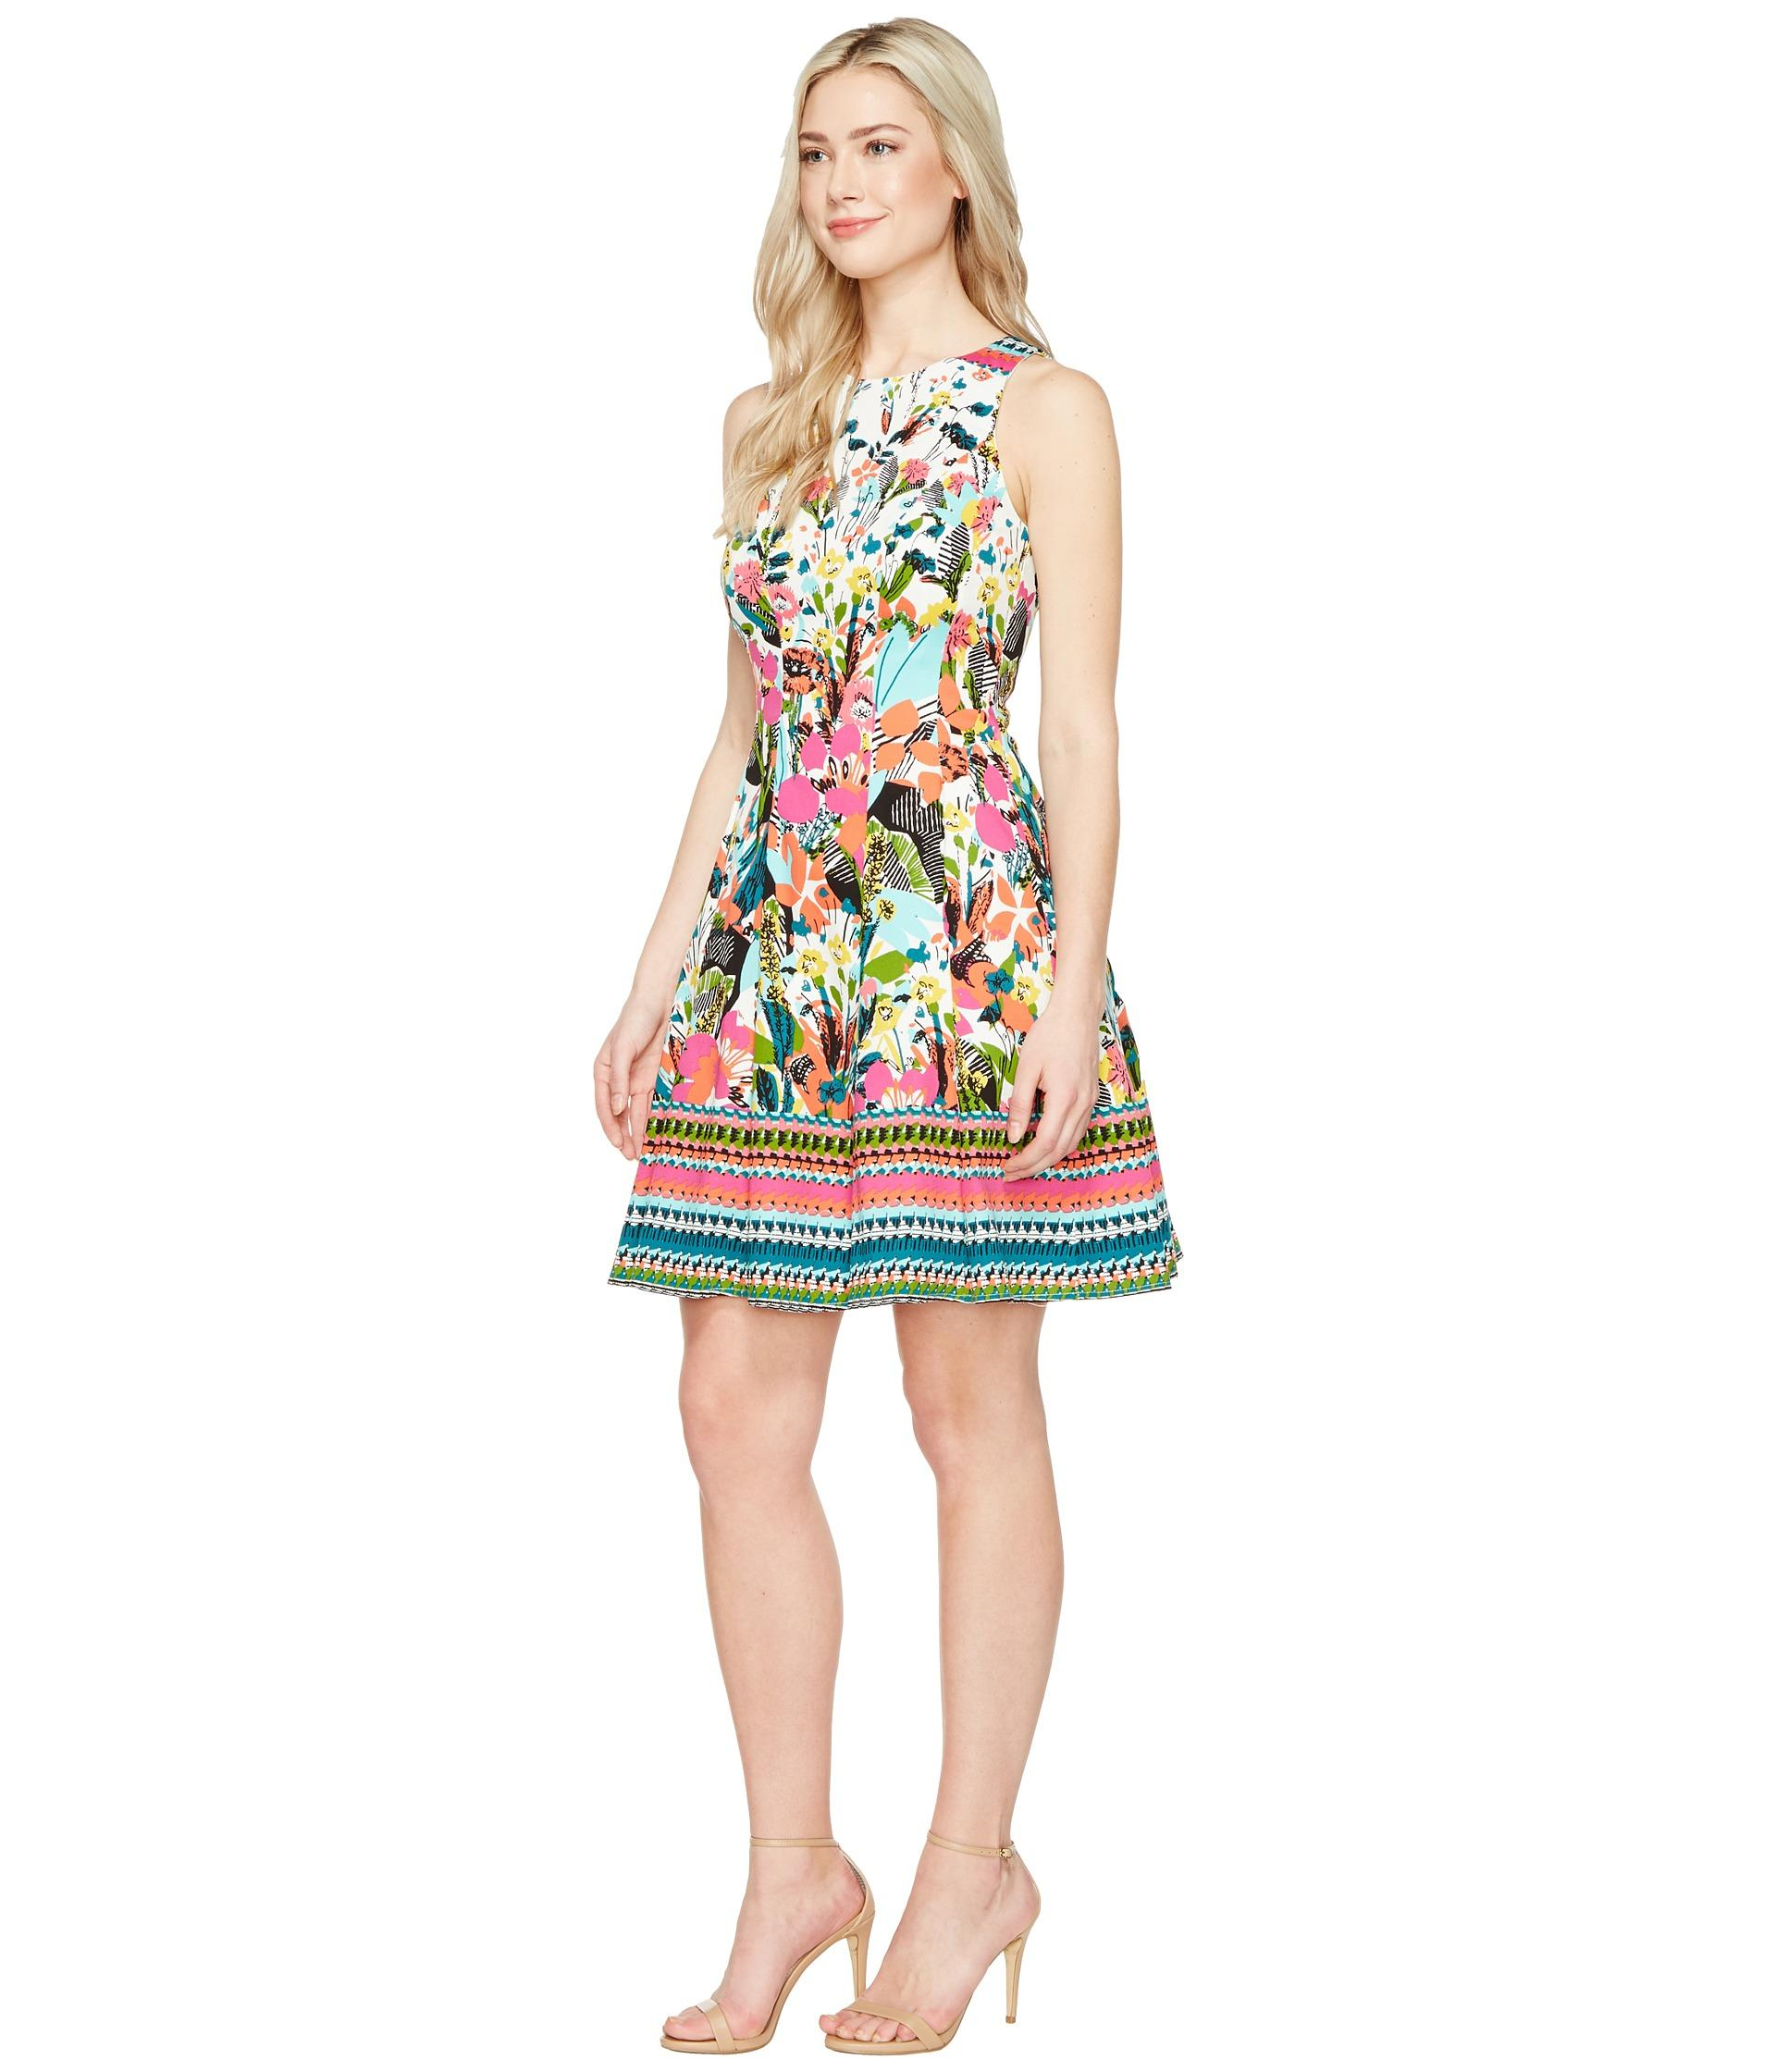 013907a522355 Lyst - Maggy London Fiesta Flower Fit   Flare Dress